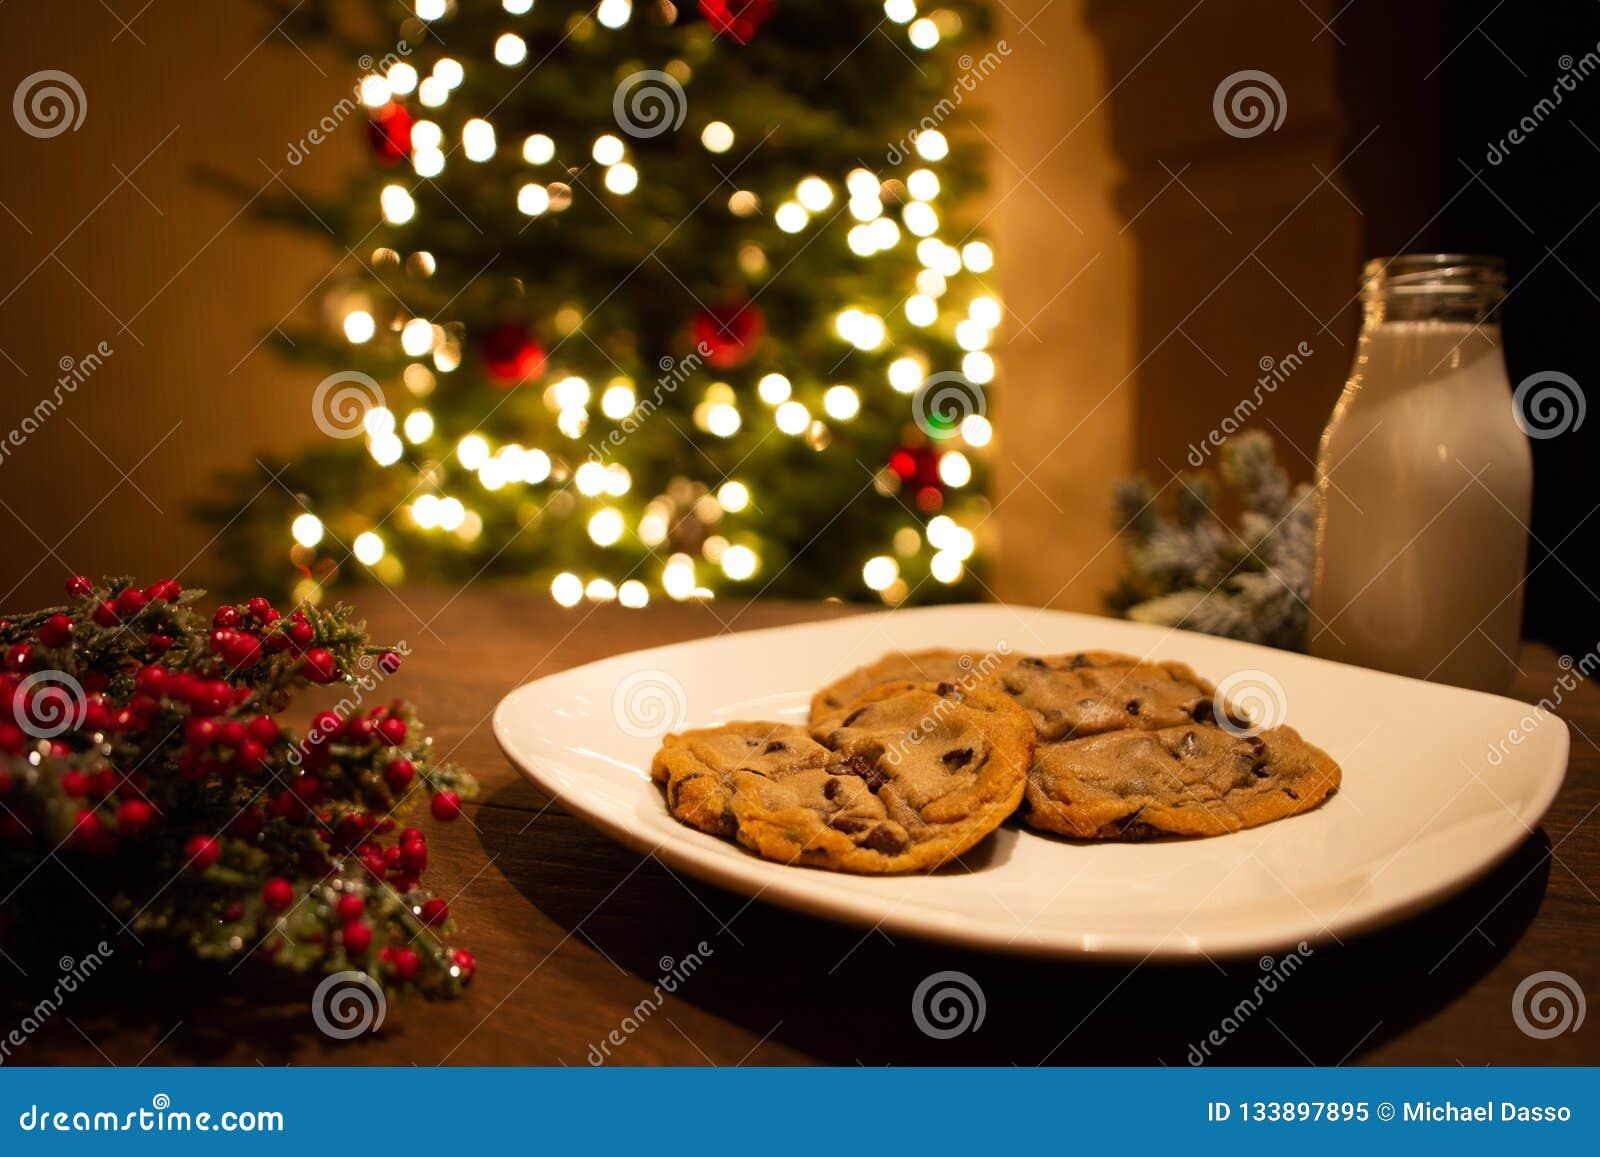 Christmas Cookies And Milk Waiting For Santa With Christmas Tree